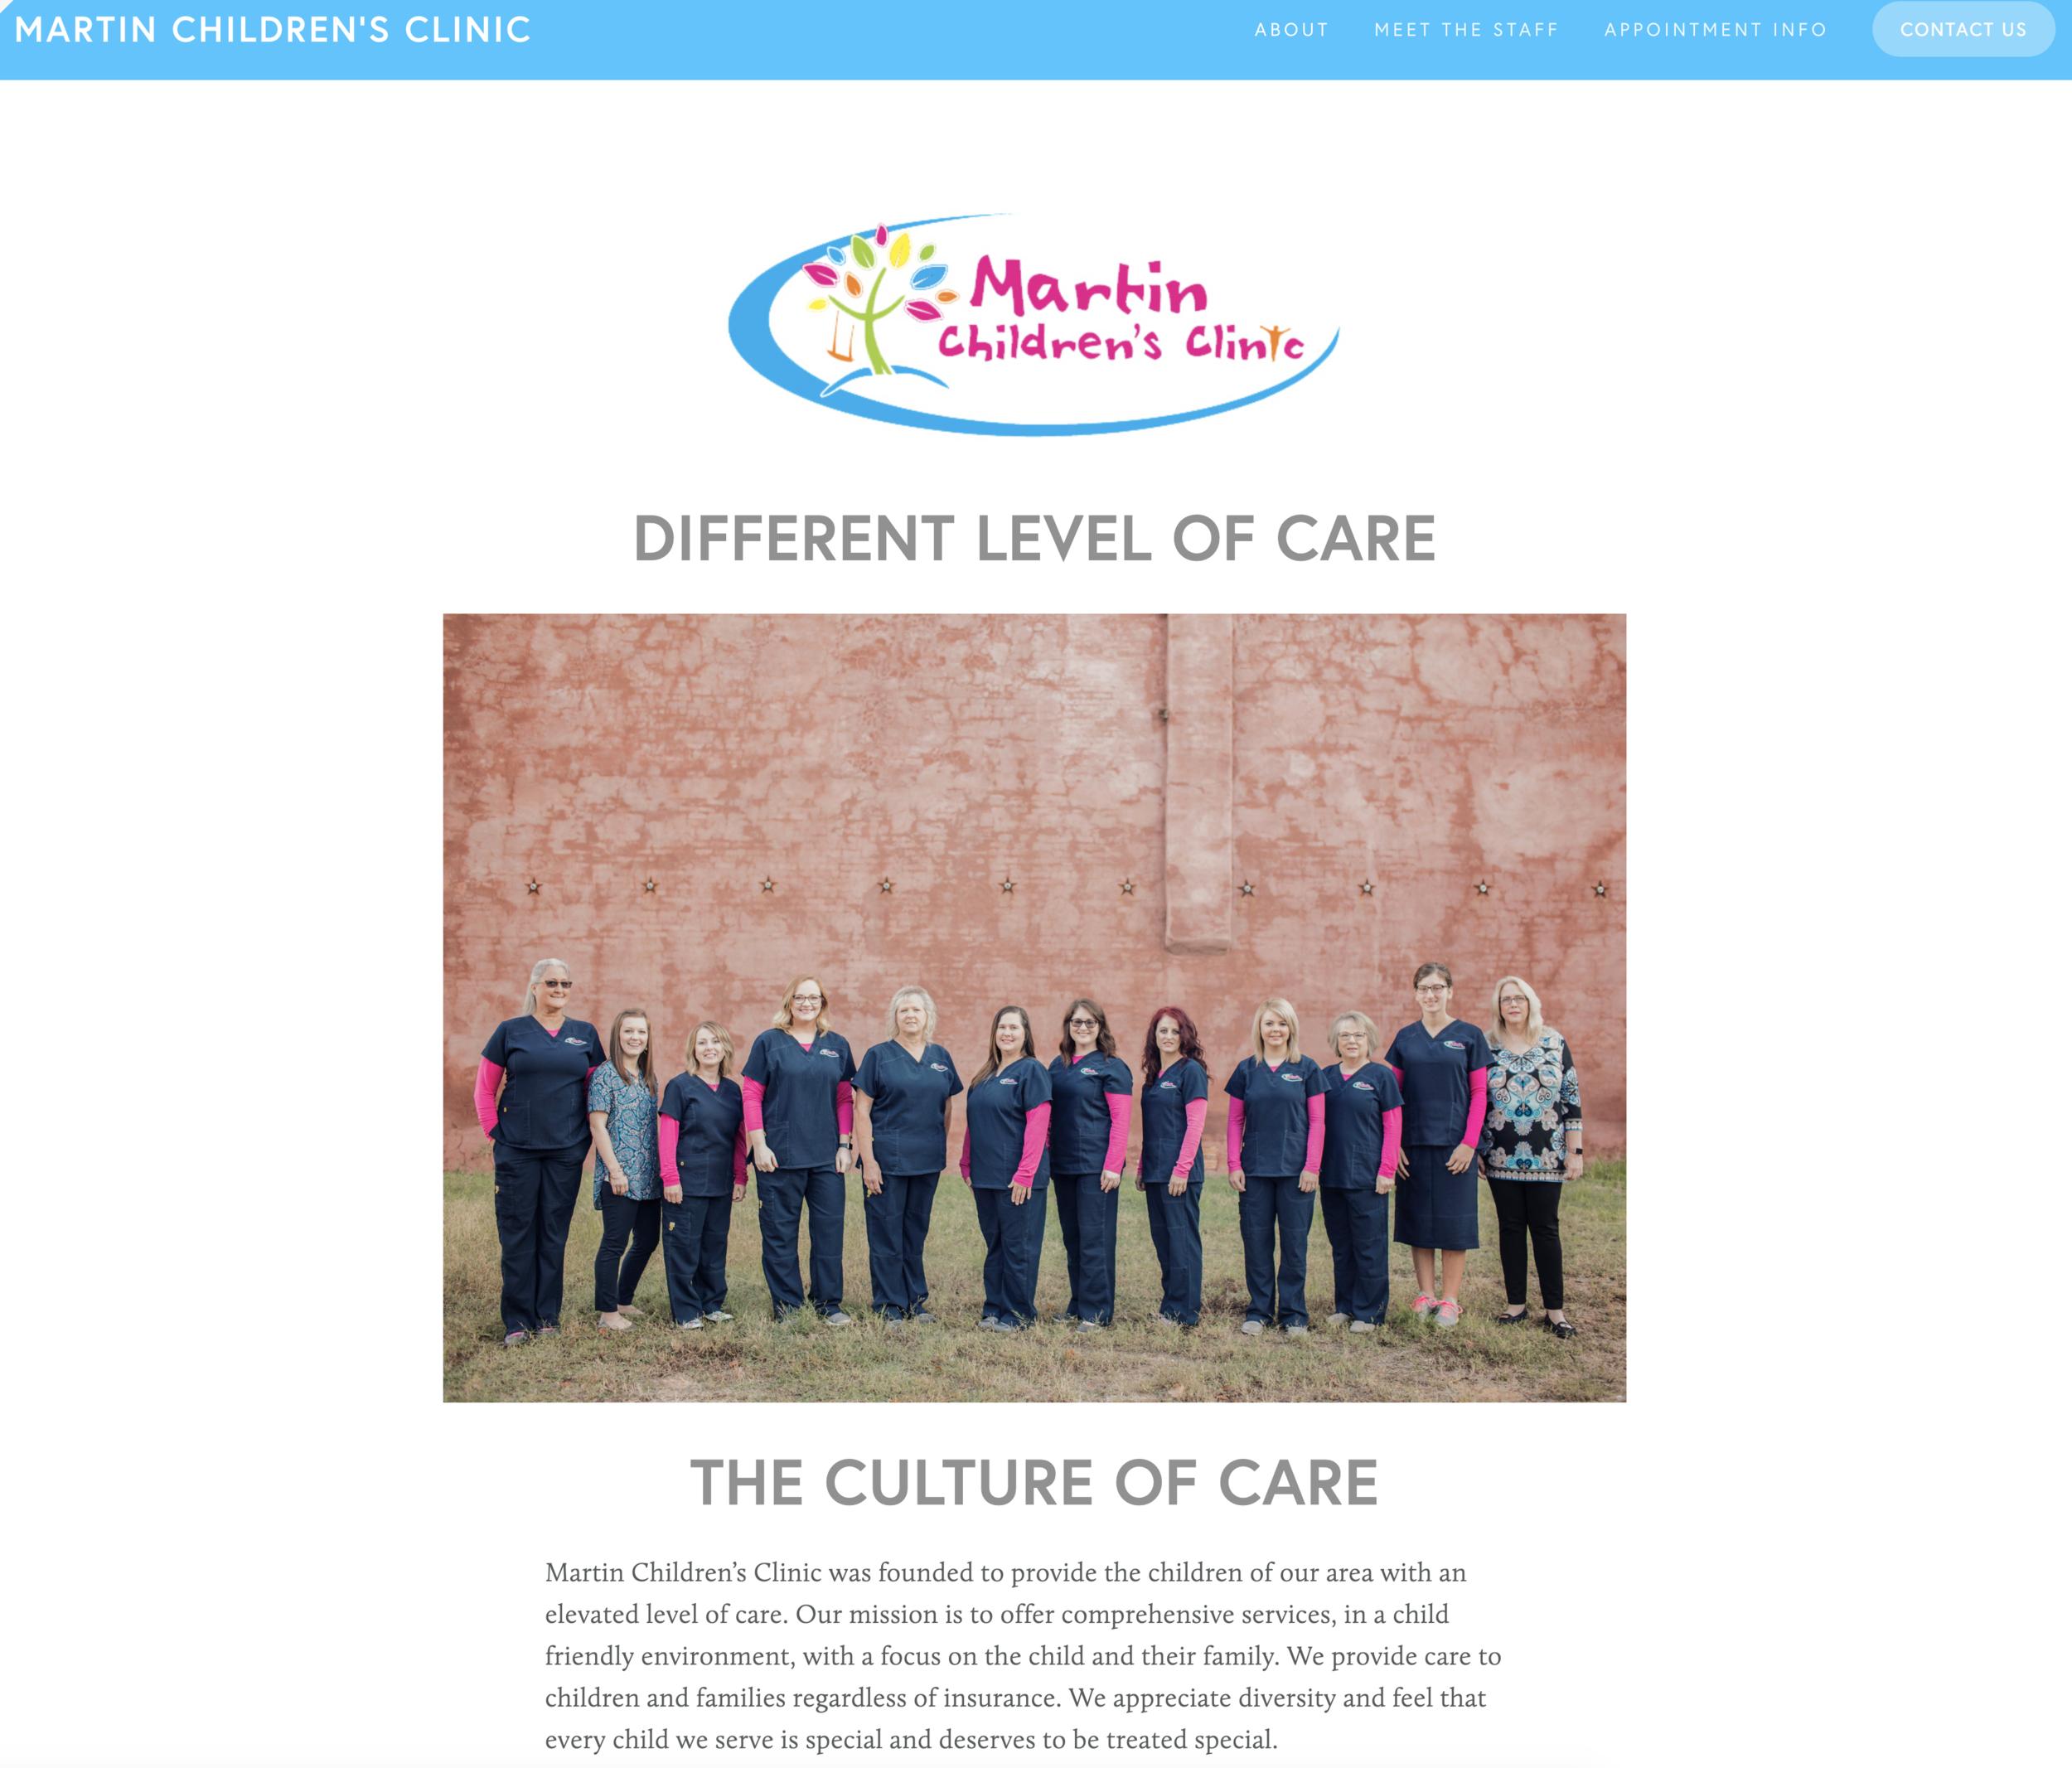 www.martinchildrensclinic.com